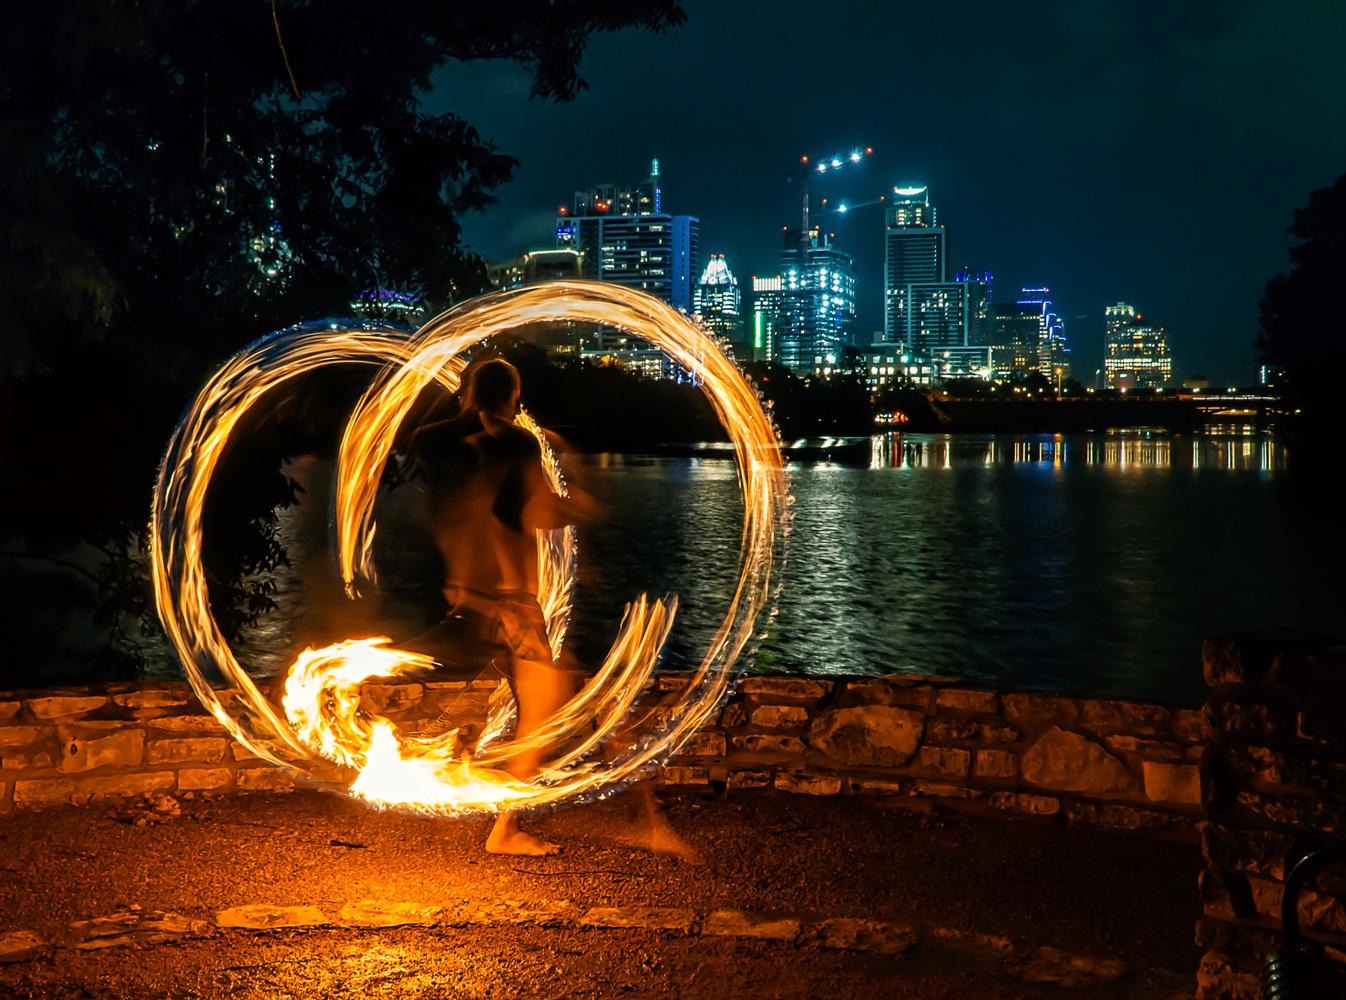 Fire Dance Austin by Eric Wilson